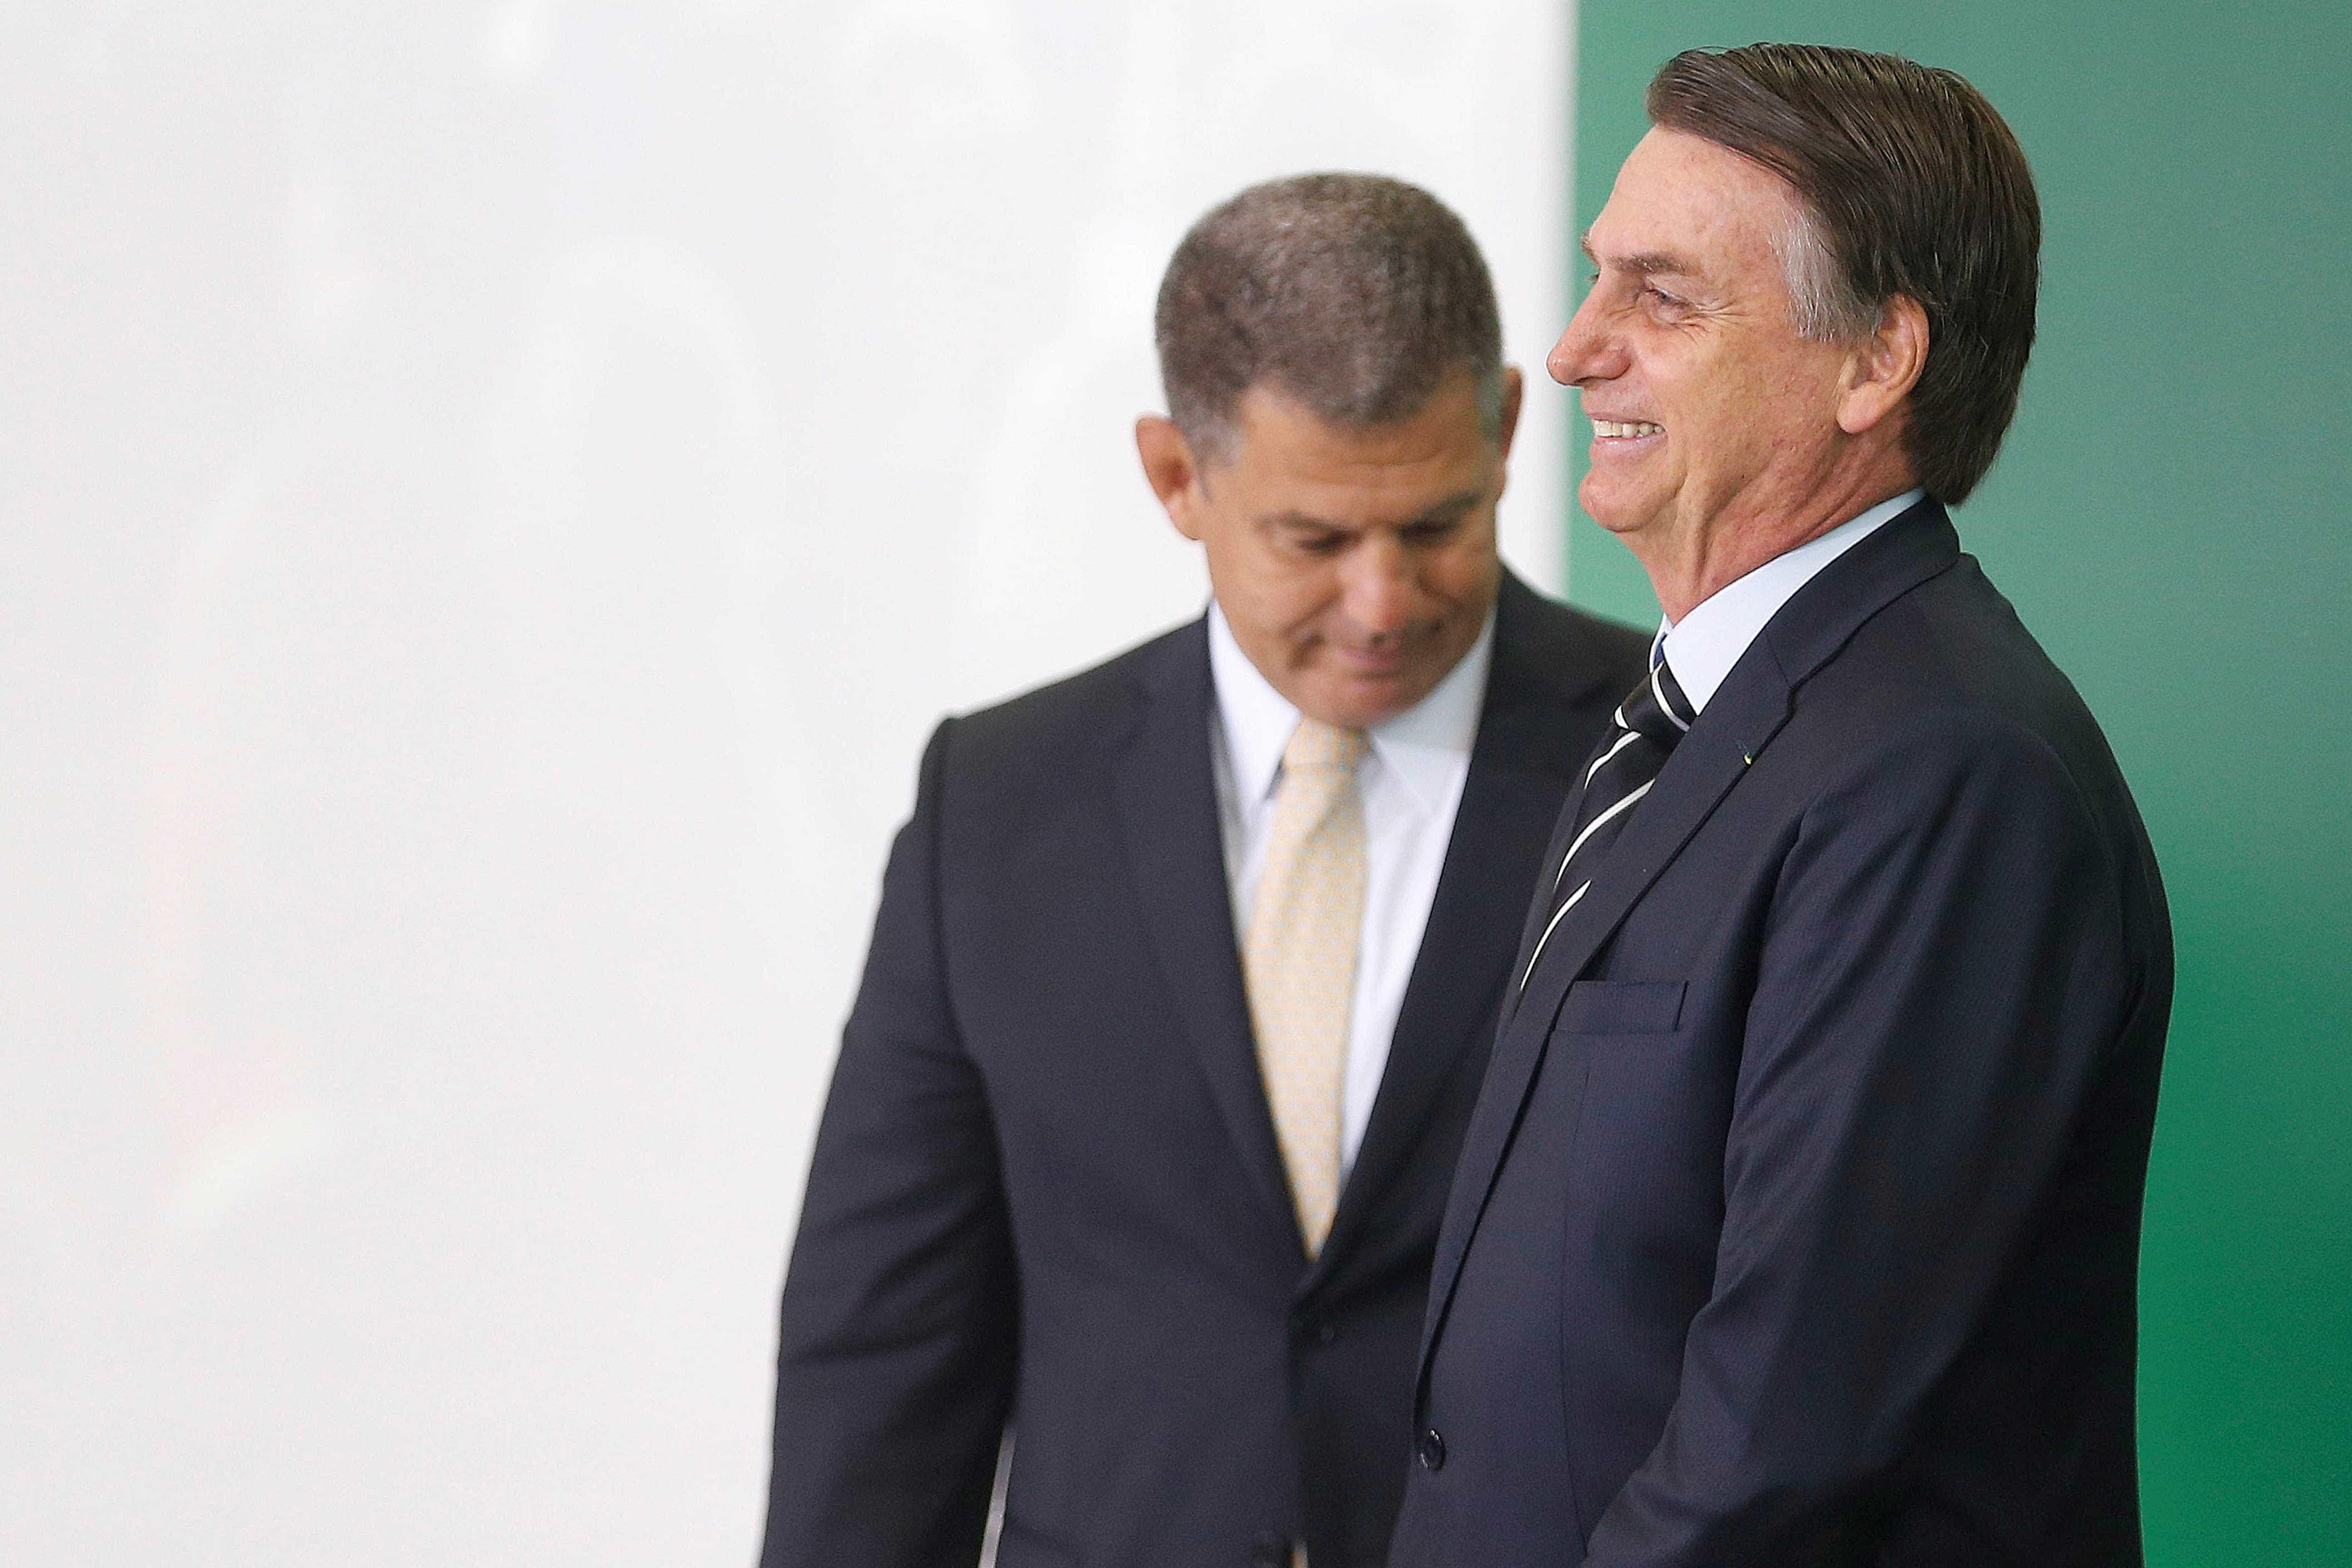 Revista divulga áudios de conversas entre Bolsonaro e Bebianno; veja